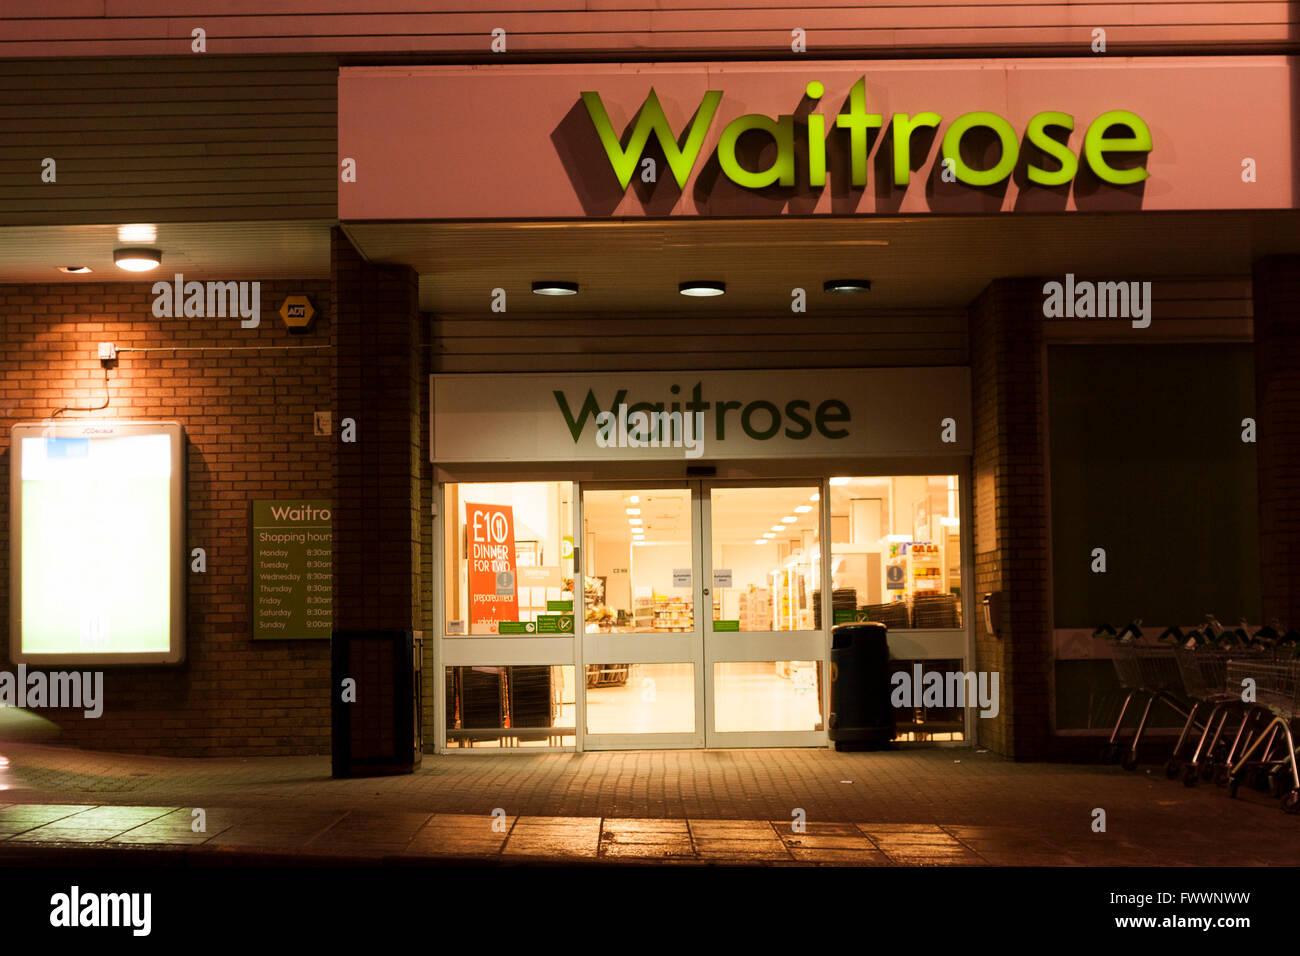 Waitrose supermarket in Edinburgh Morningside at night.  Photos by Pako Mera - Stock Image